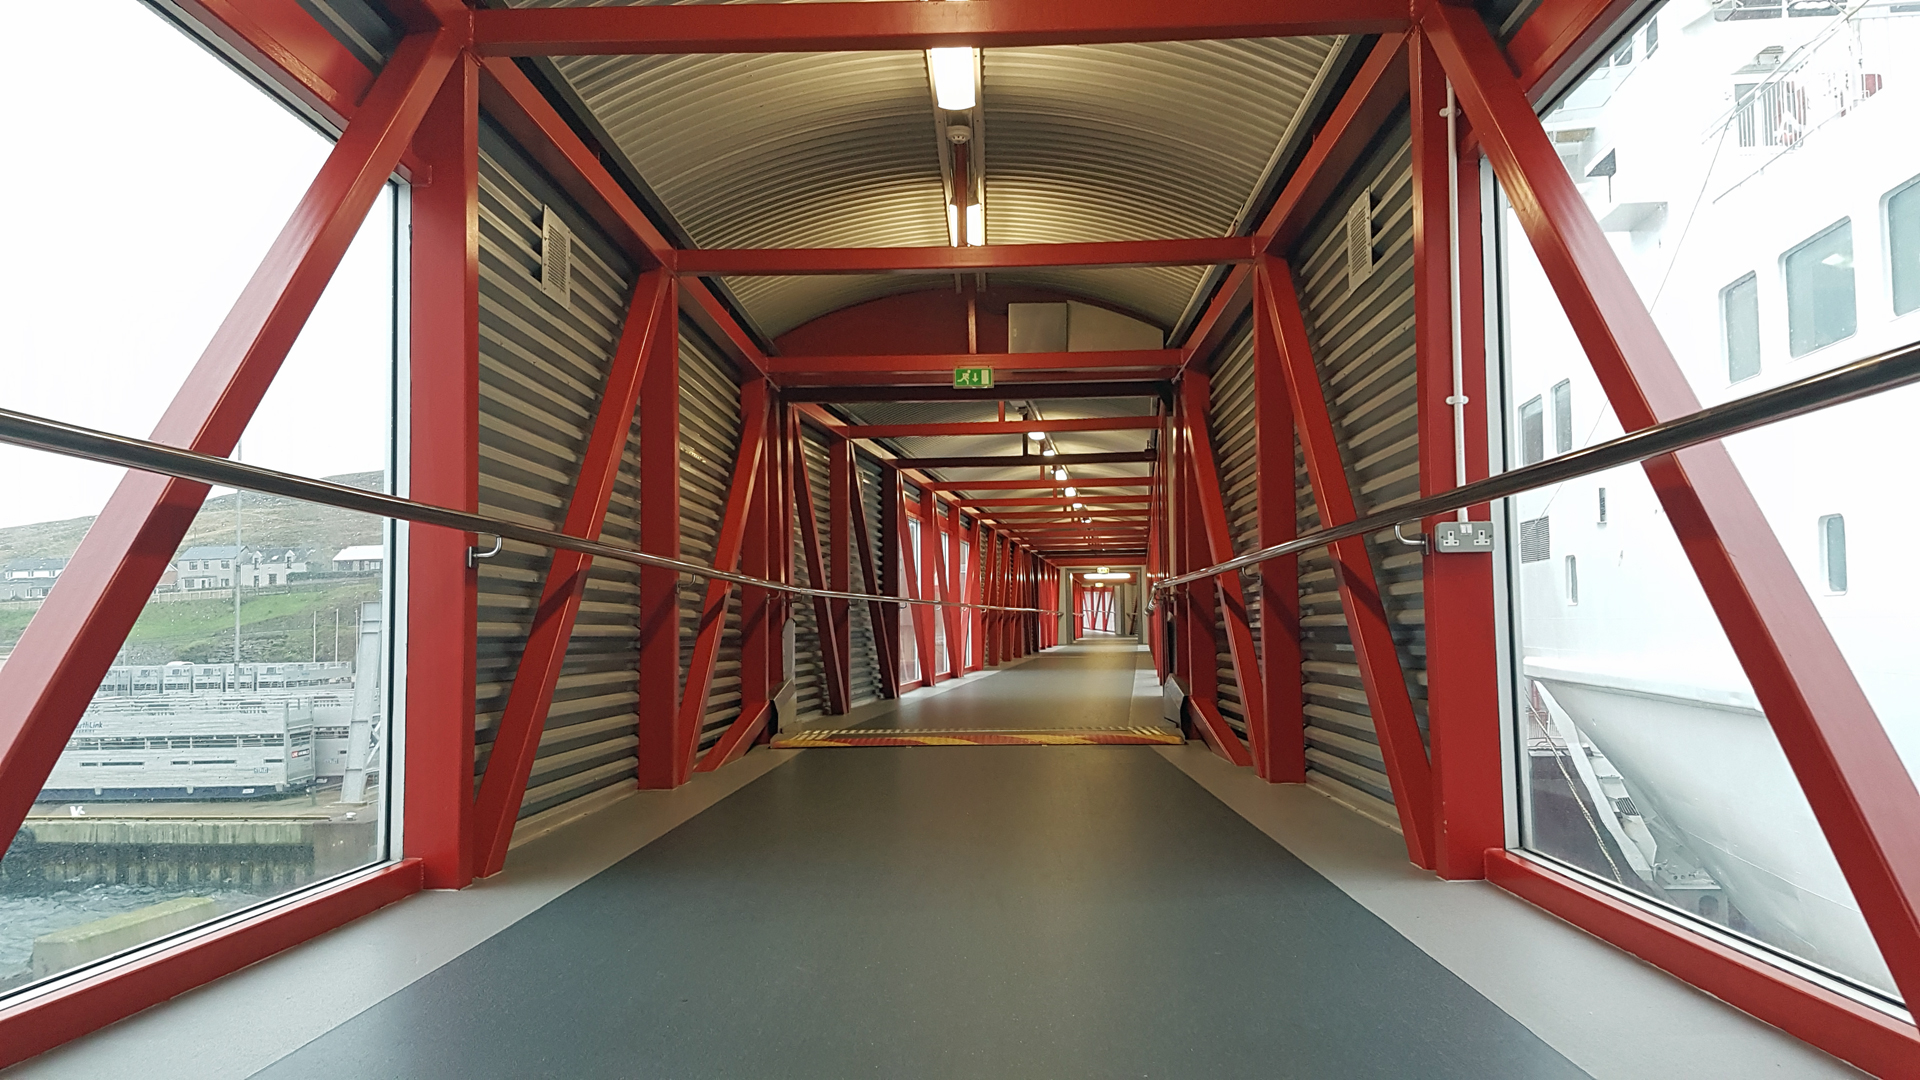 NorthLink Ferries Lerwick Ferry Terminal gangway.